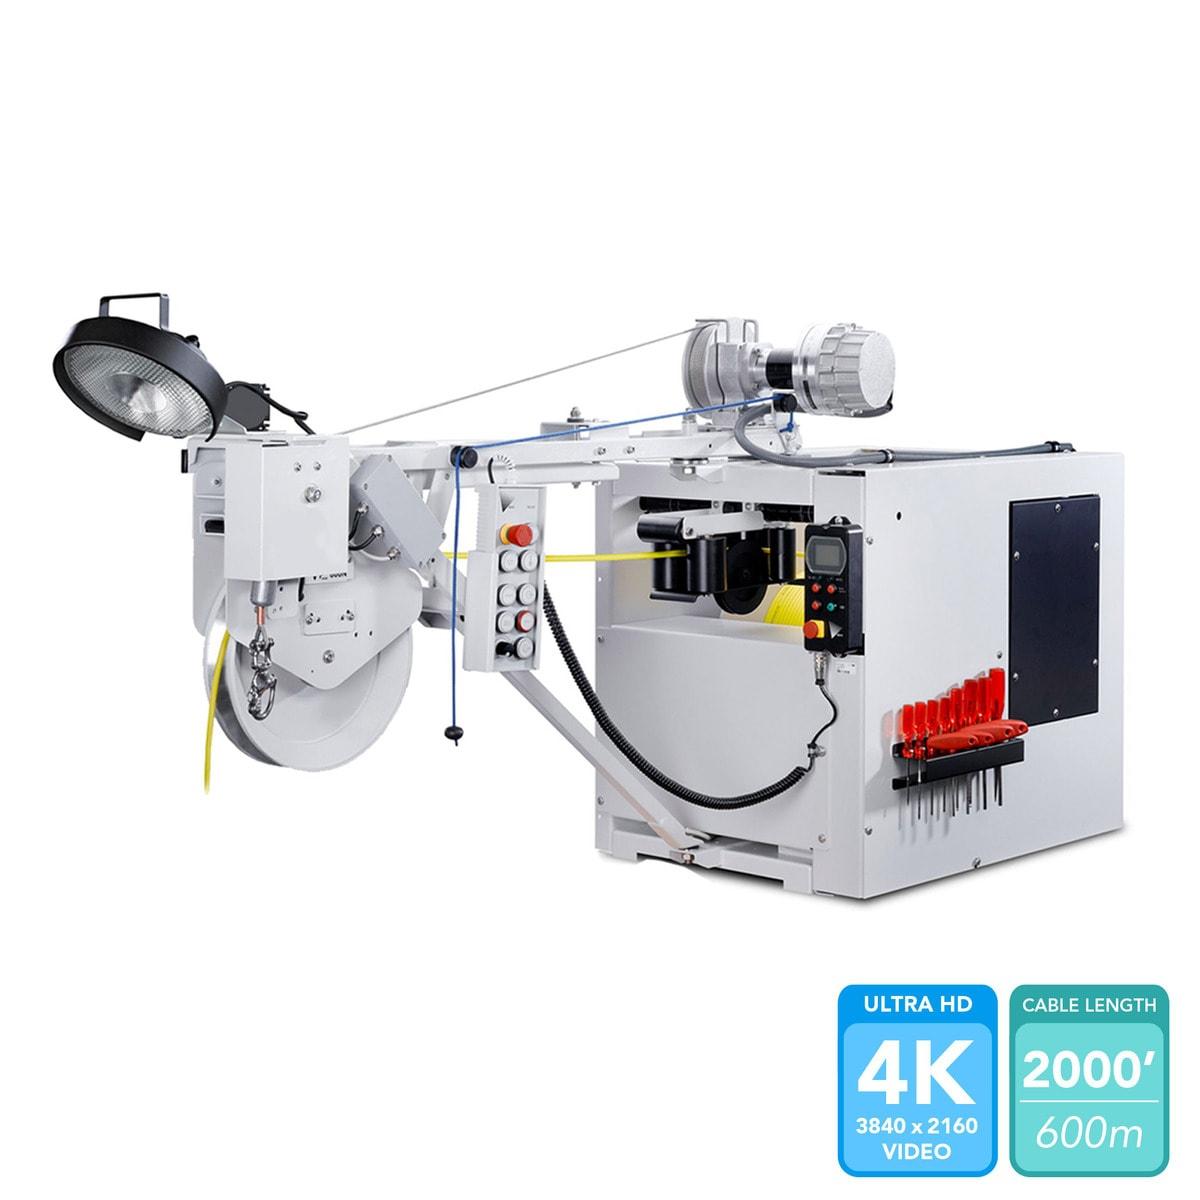 KW 505 Fiber Optic Cable Reel